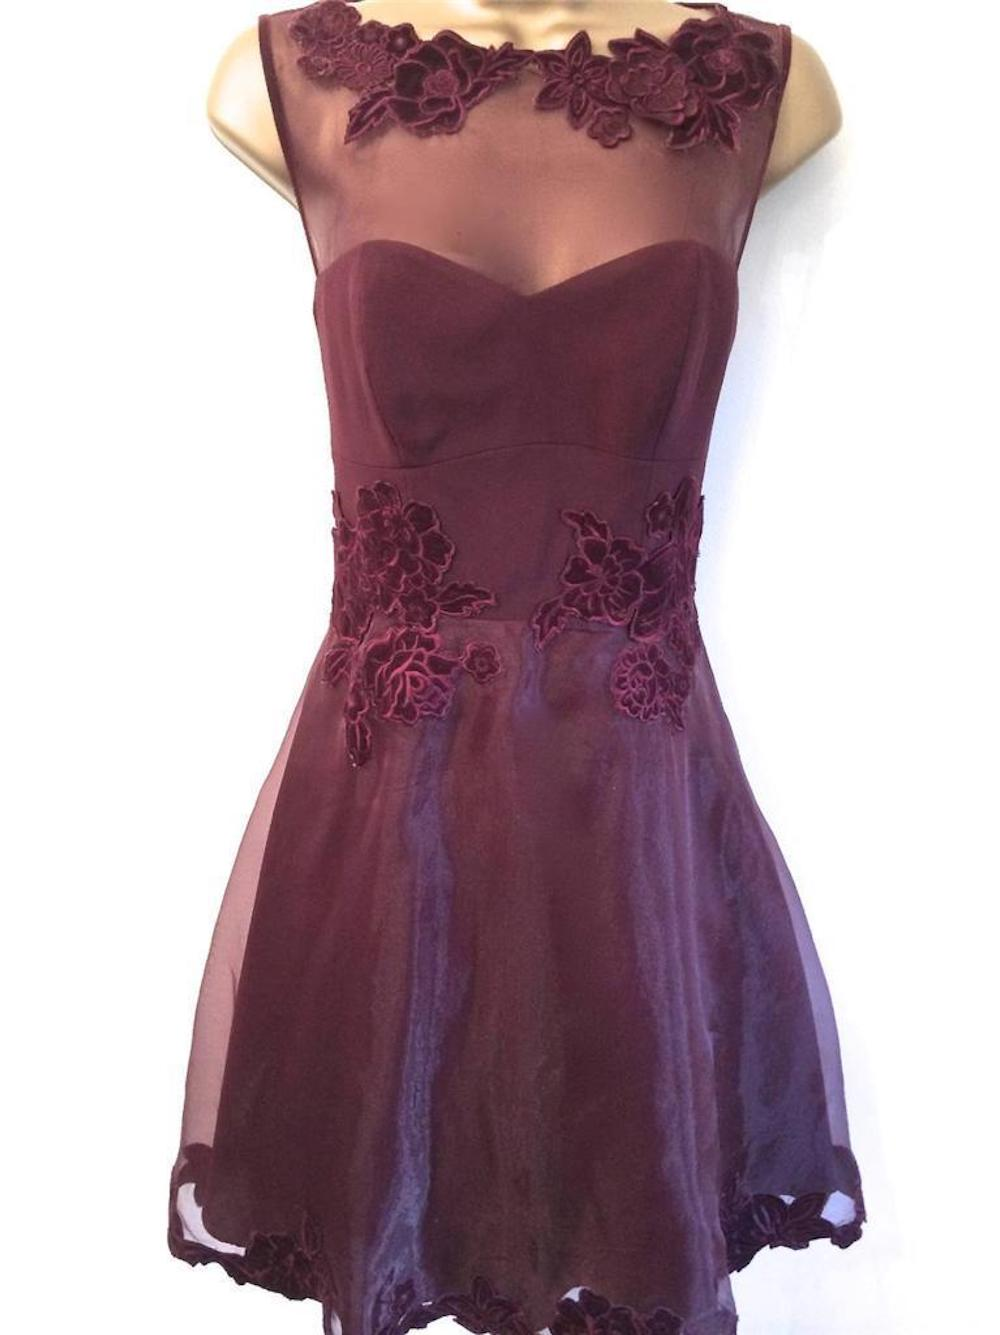 Dr148 Karen Millen Burgundy Velvet Applique Organza Prom Dress